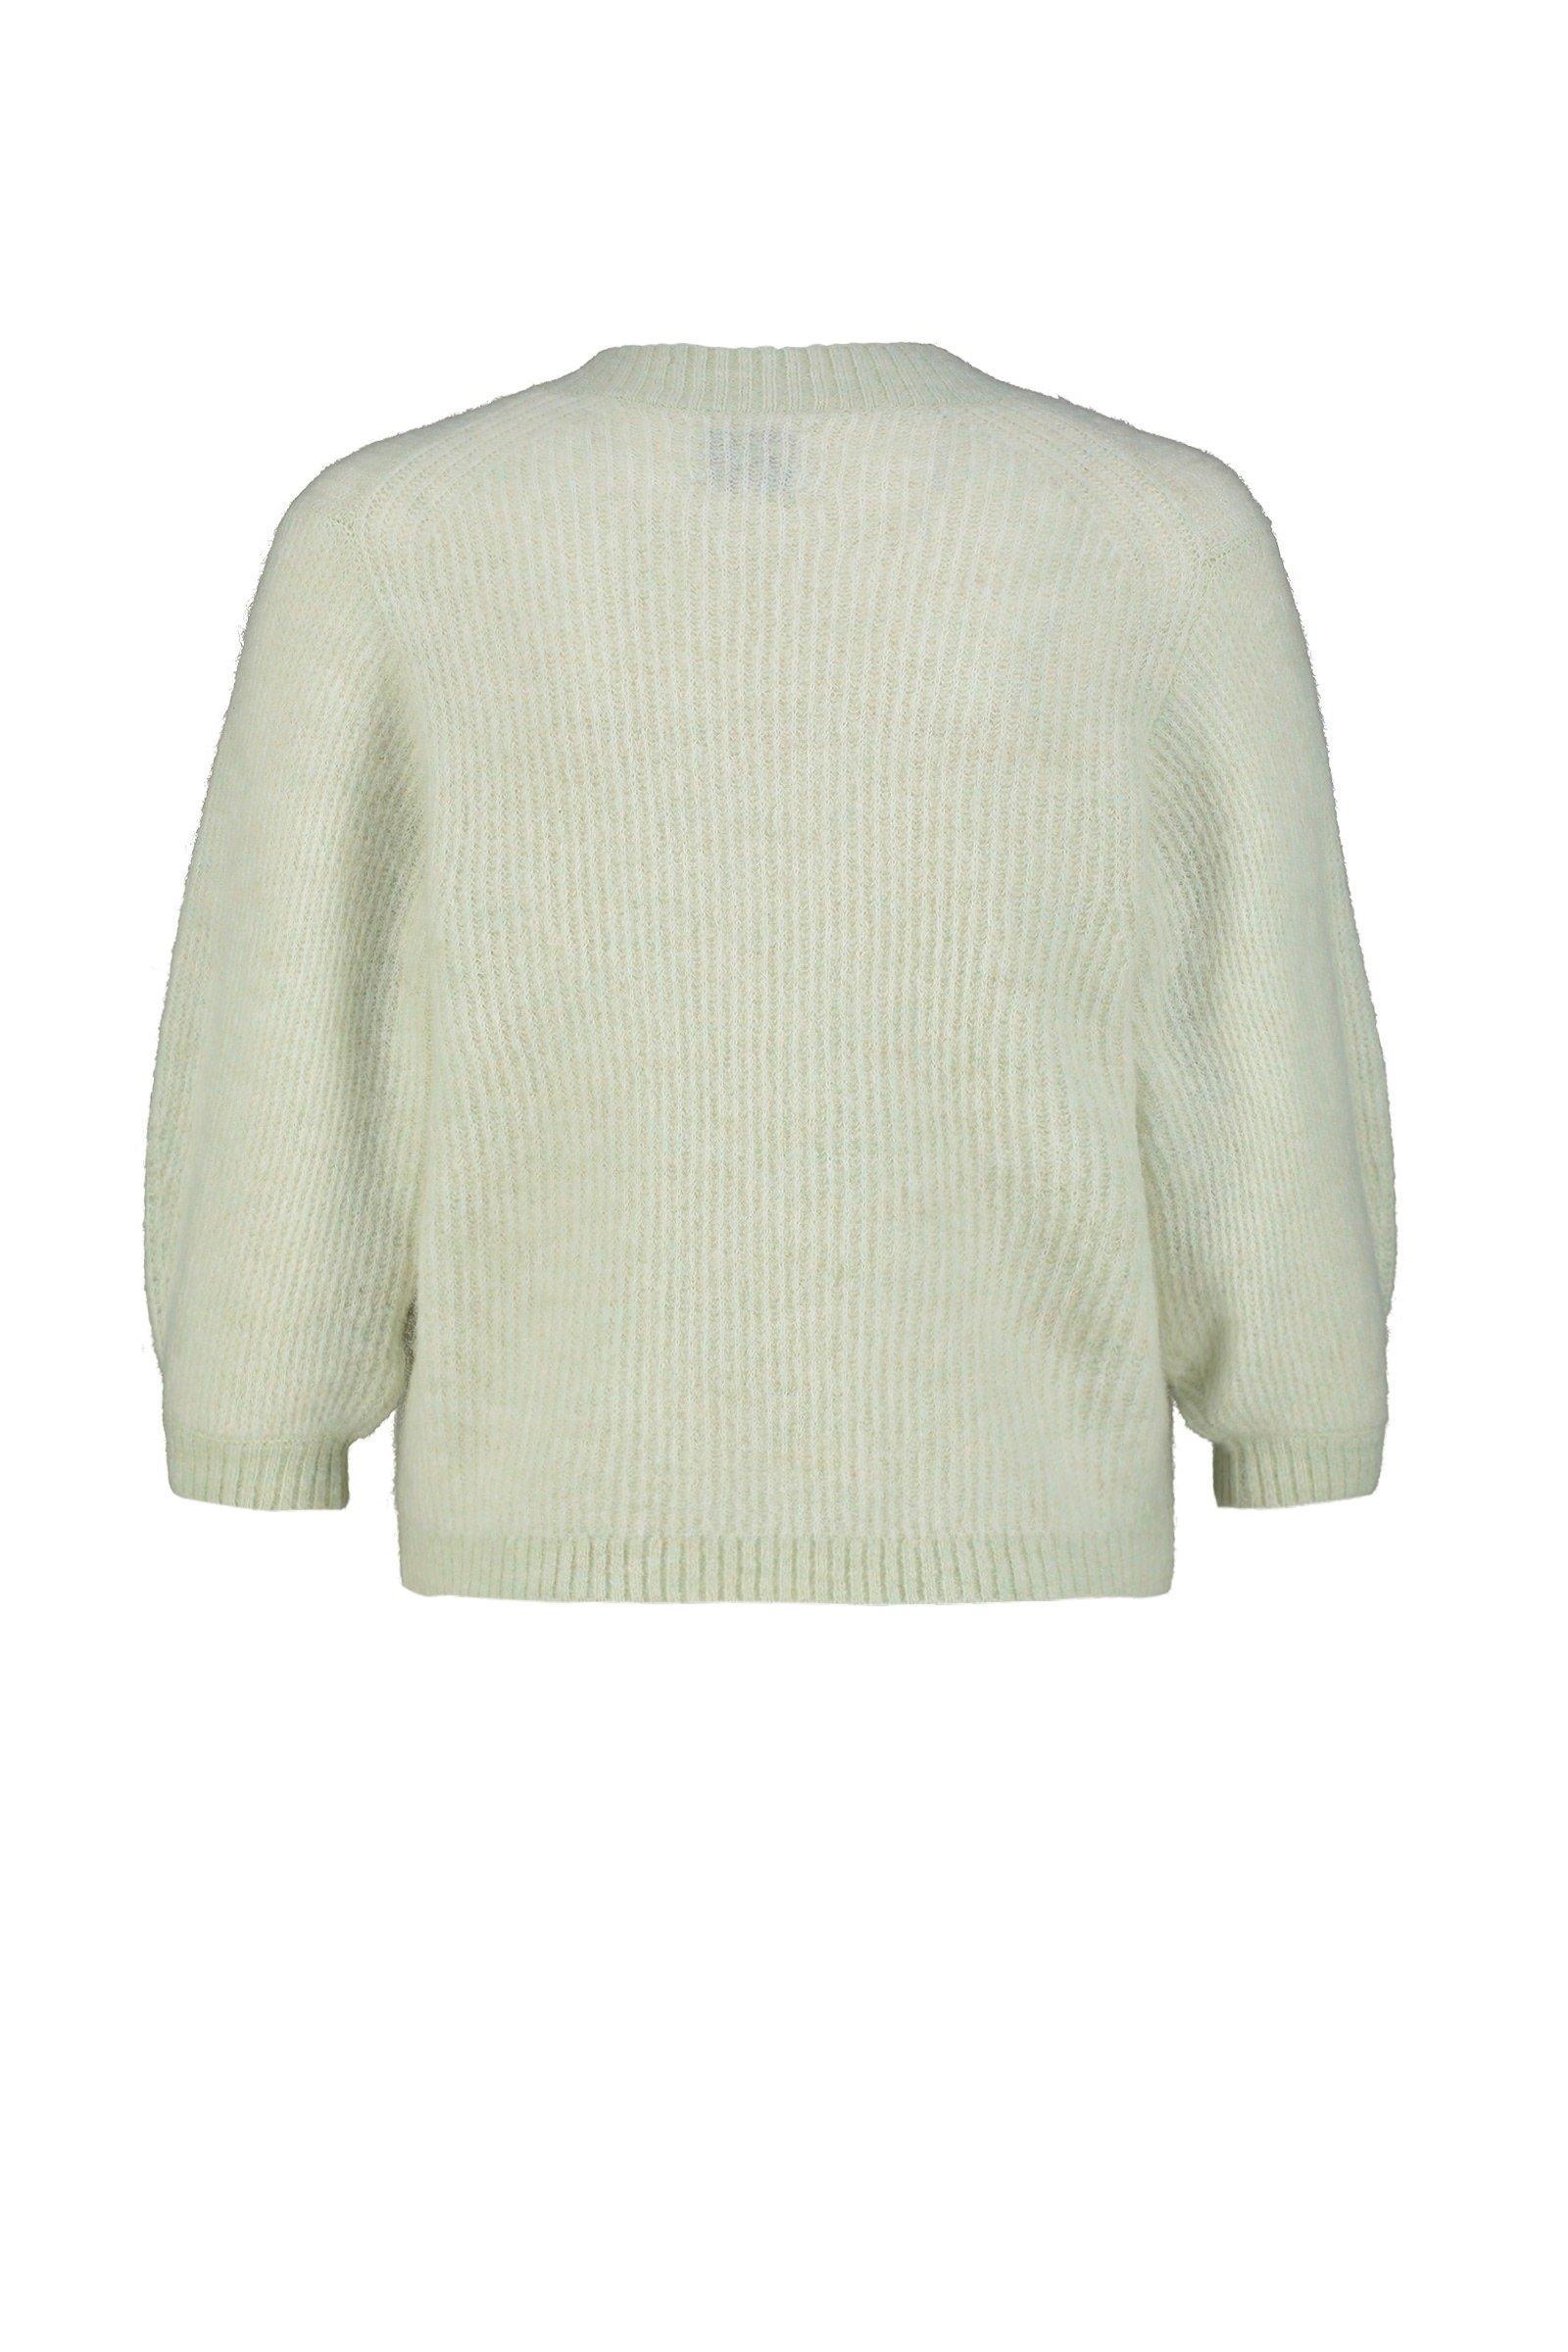 https://webmedia.cks-fashion.com/i/cks/119328GNM_100_h